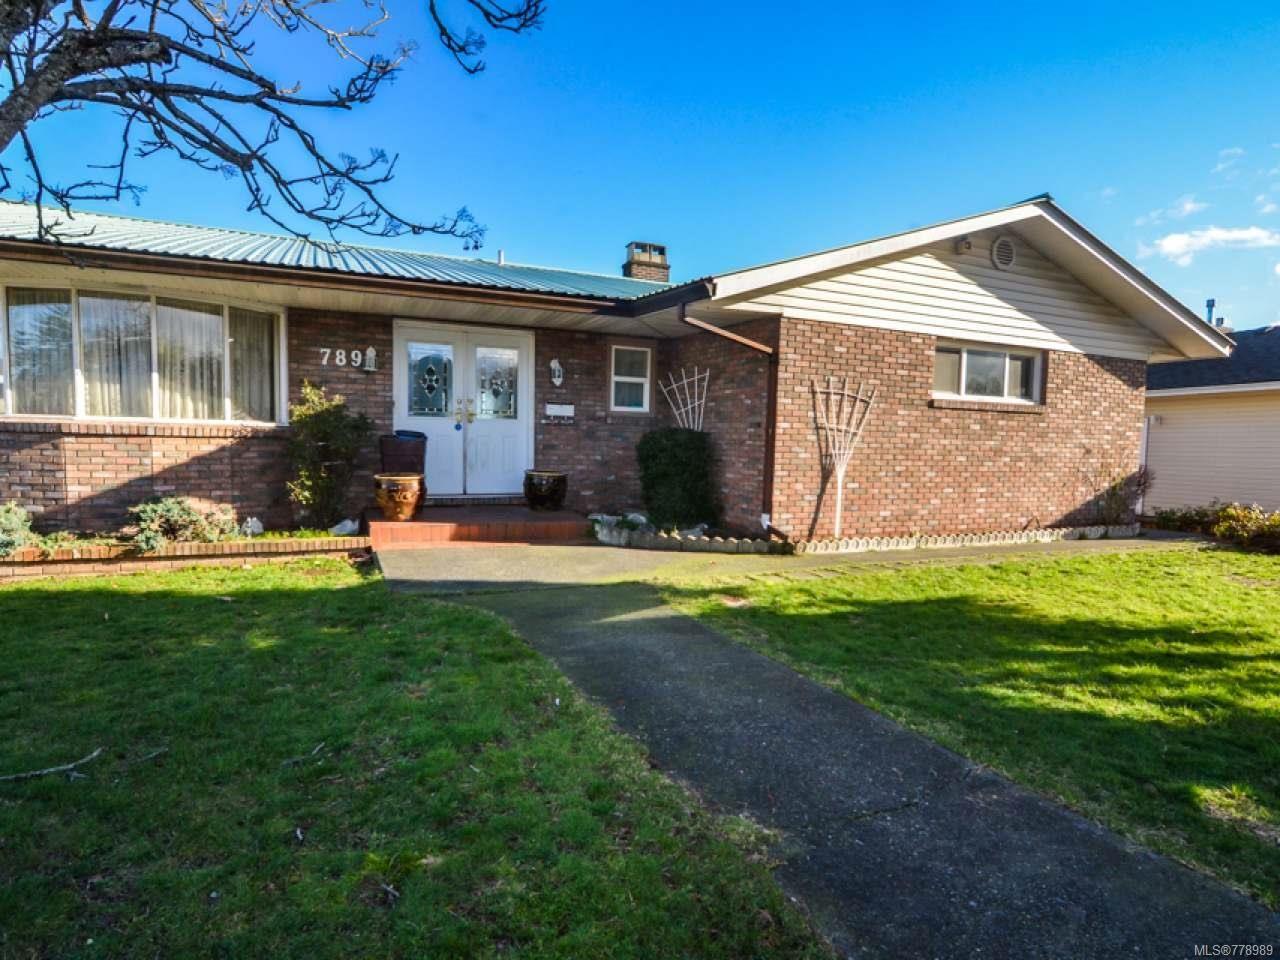 Main Photo: 789 Nancy Greene Dr in CAMPBELL RIVER: CR Campbell River Central House for sale (Campbell River)  : MLS®# 778989